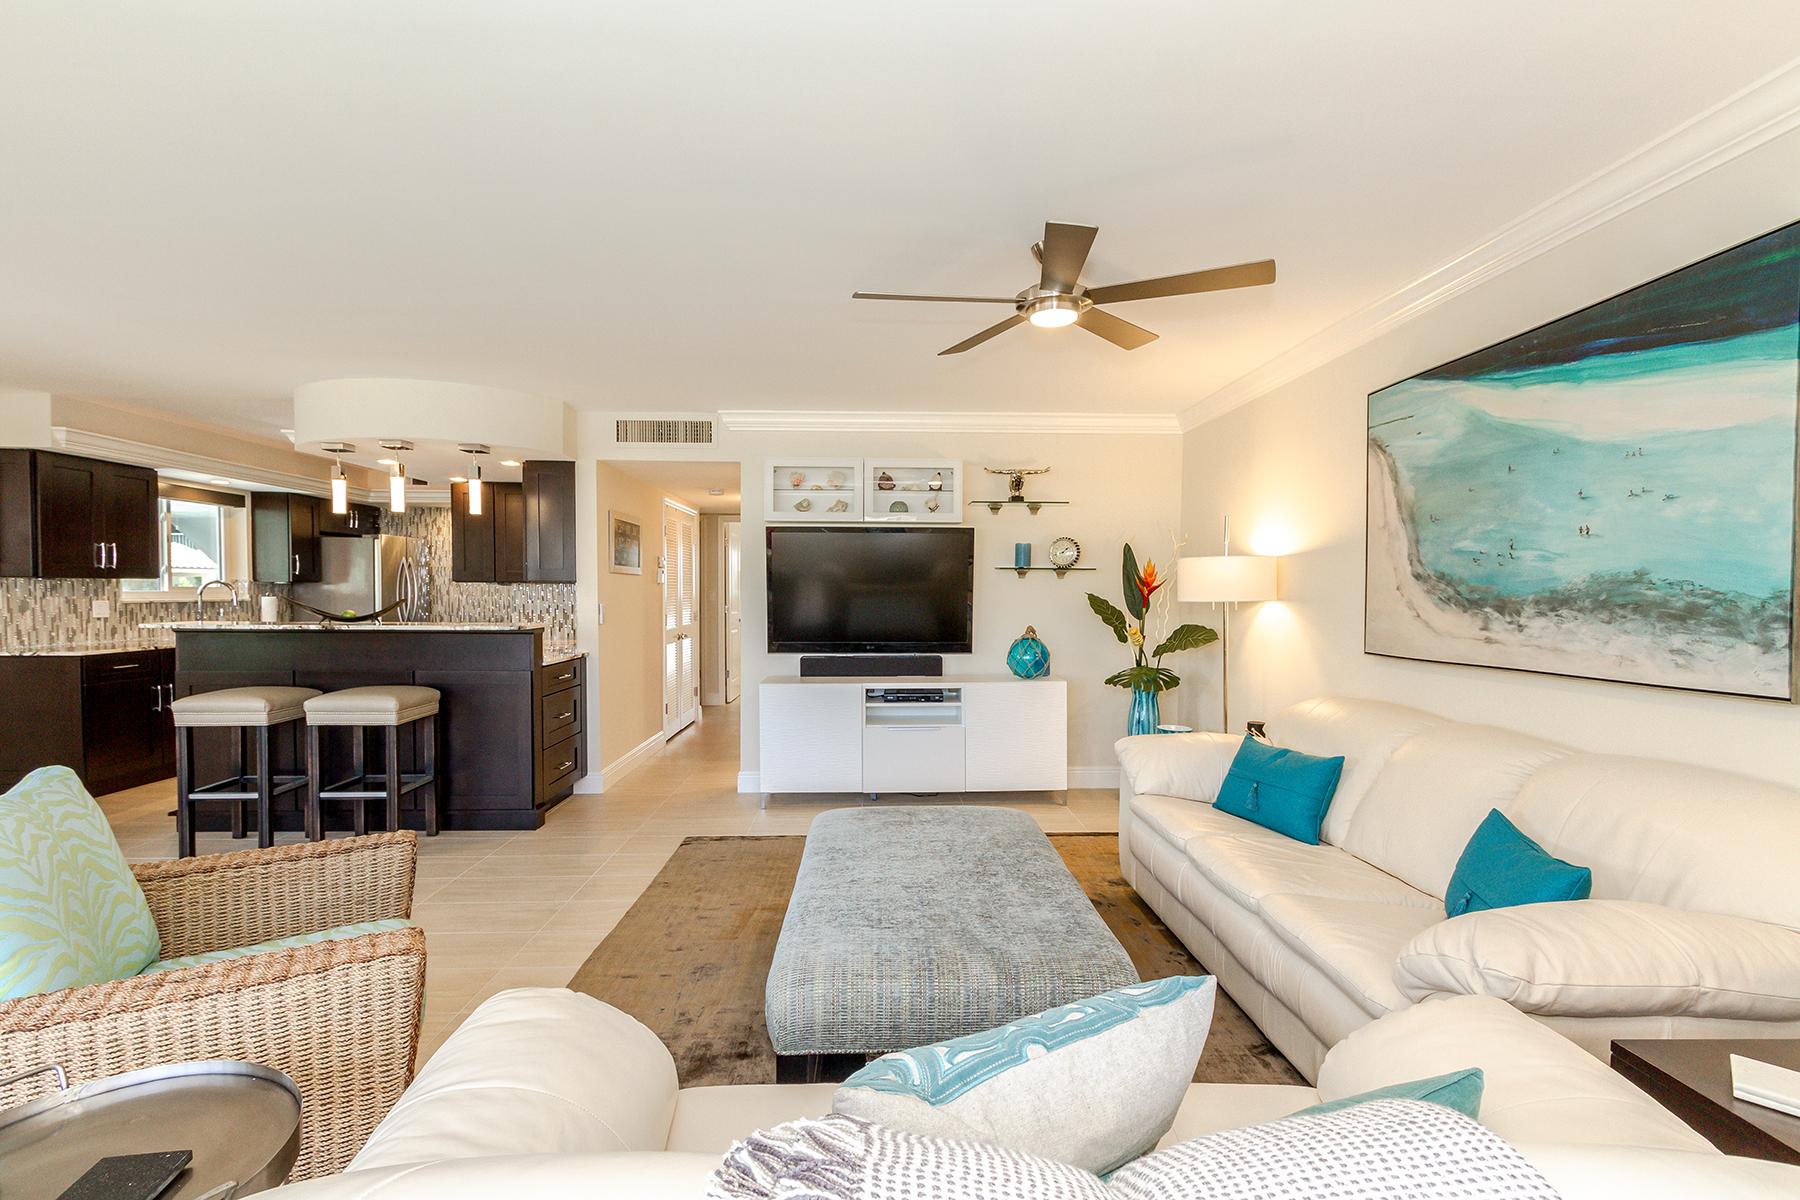 Condominium for Rent at YACHT HARBOR MANOR - YACHT HARBOR MANOR 2500 Gulf Shore Blvd N N1, Naples, Florida 34103 United States